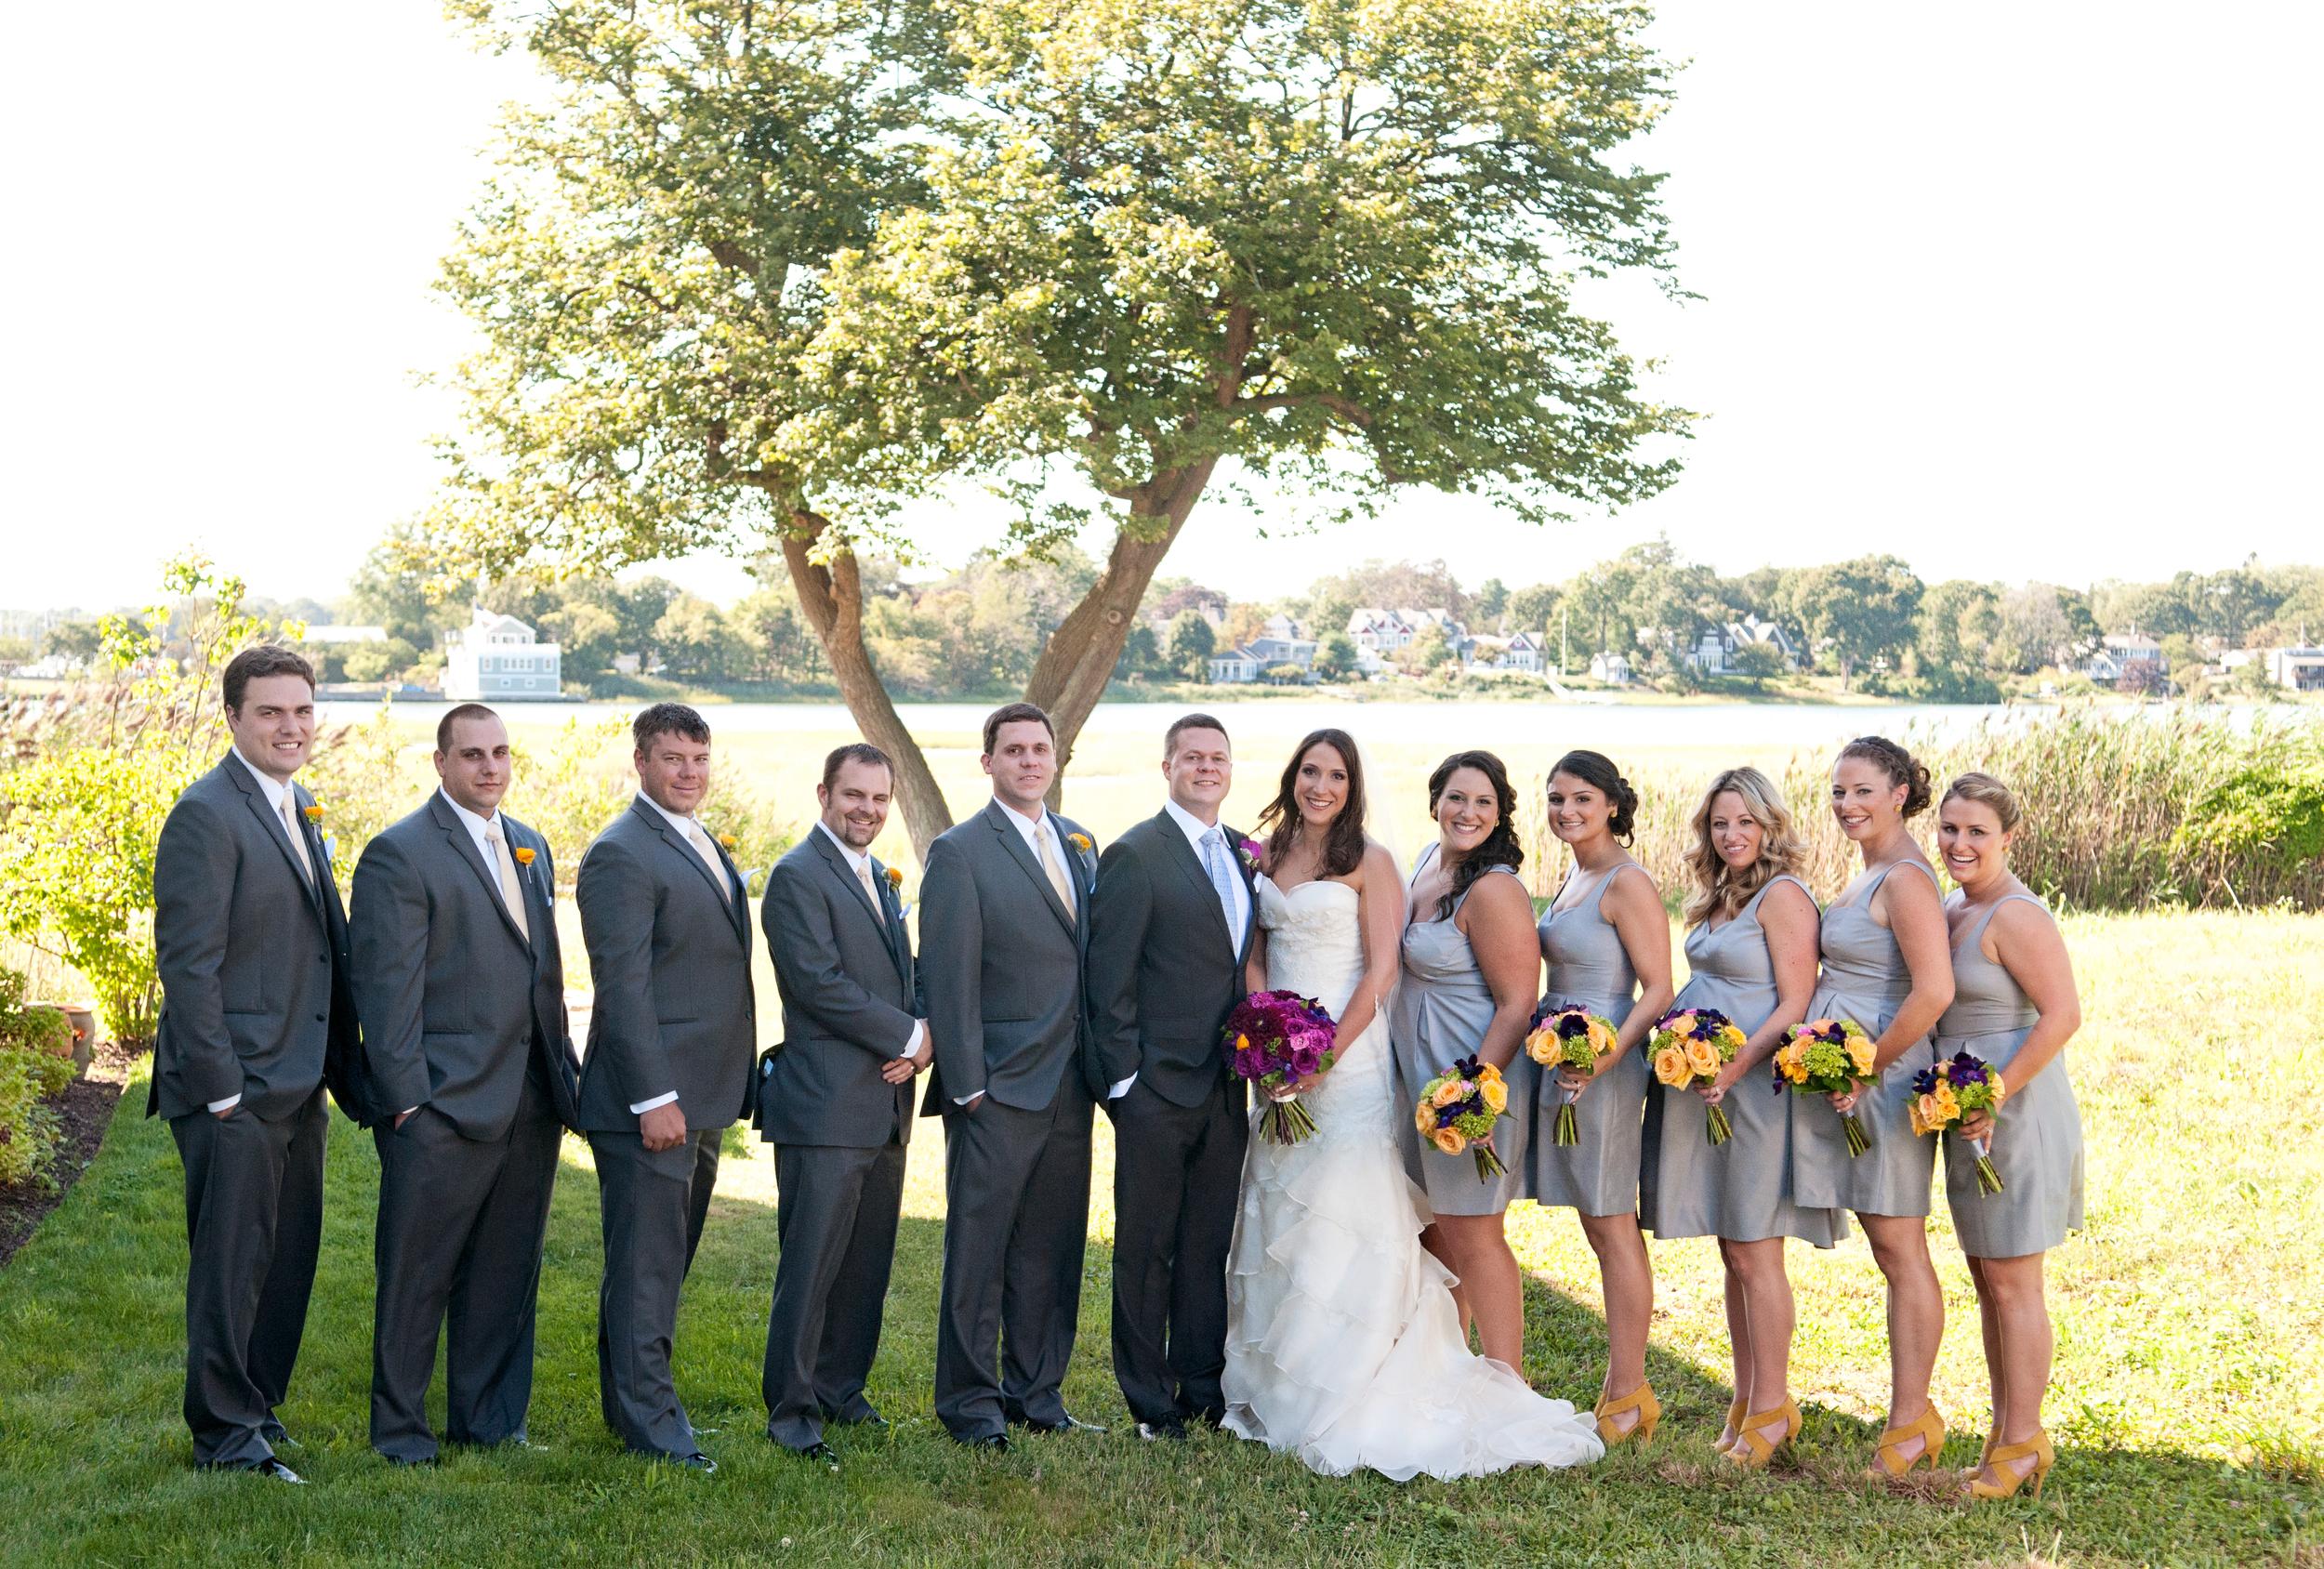 Angela_Chicoski_CT_wedding_photographer_006.jpg